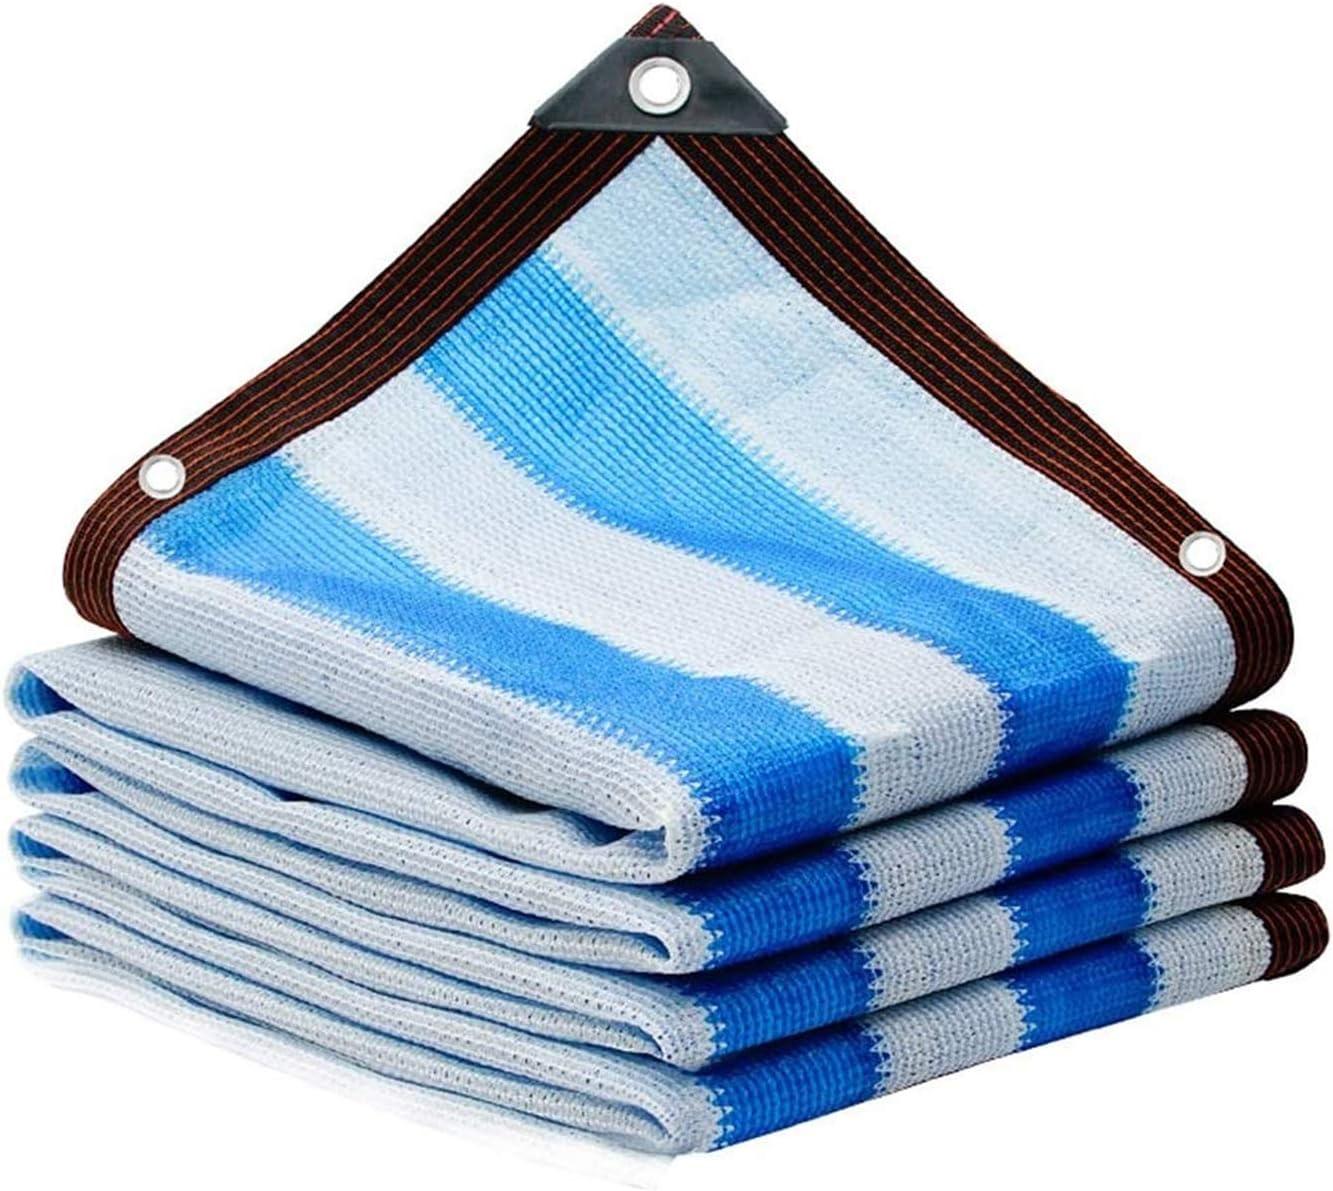 TYHZ Shade Cloth 90% Sun Net Fabric Mesh Ranking TOP10 Sun-Block 2021 spring and summer new